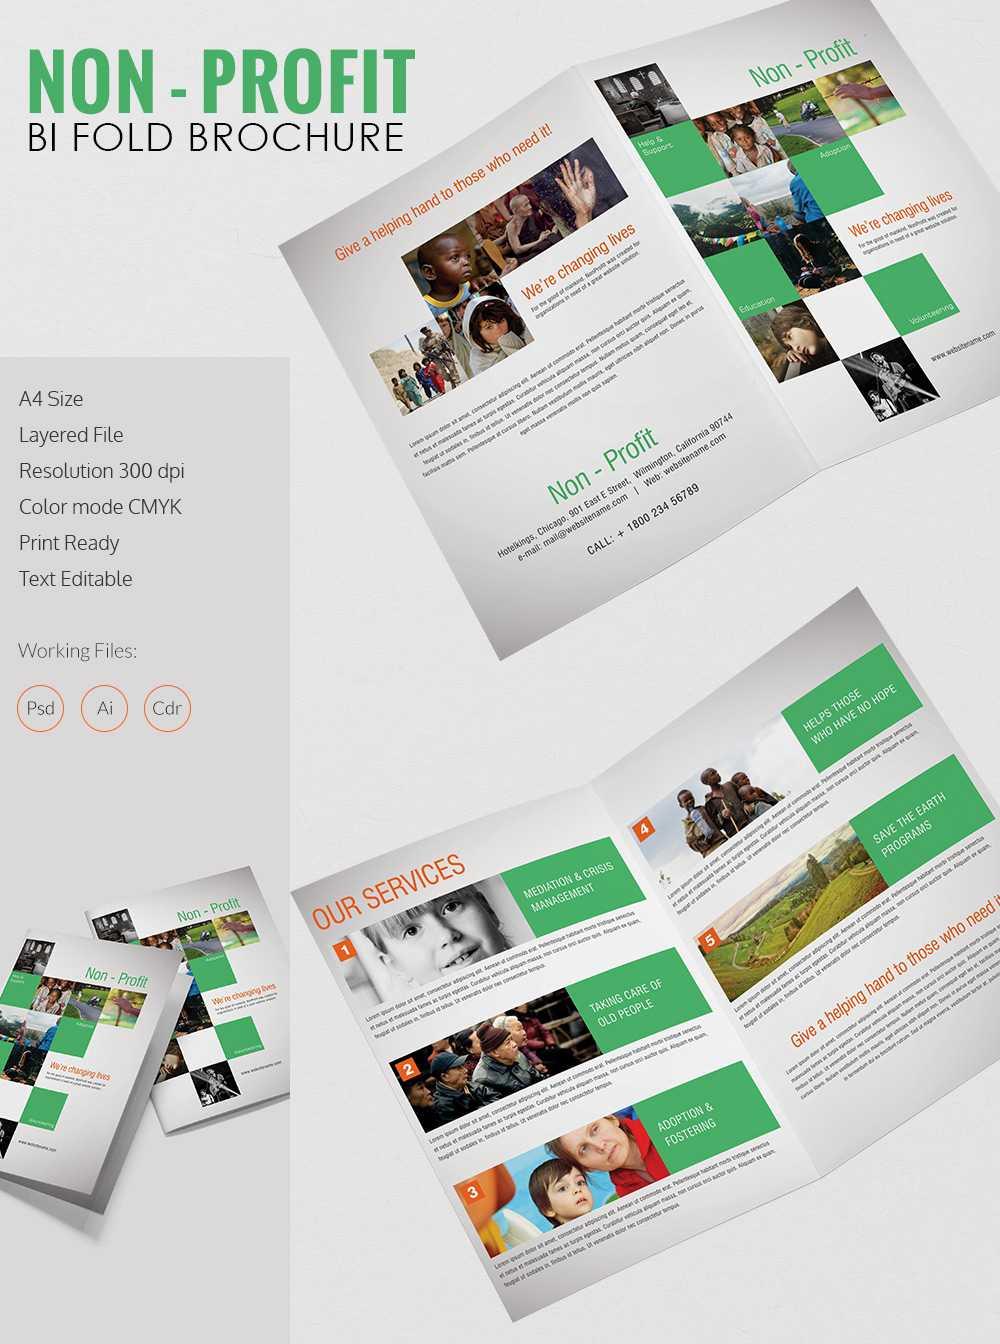 Illustrator Brochure Templates Free Download in Brochure Template Illustrator Free Download